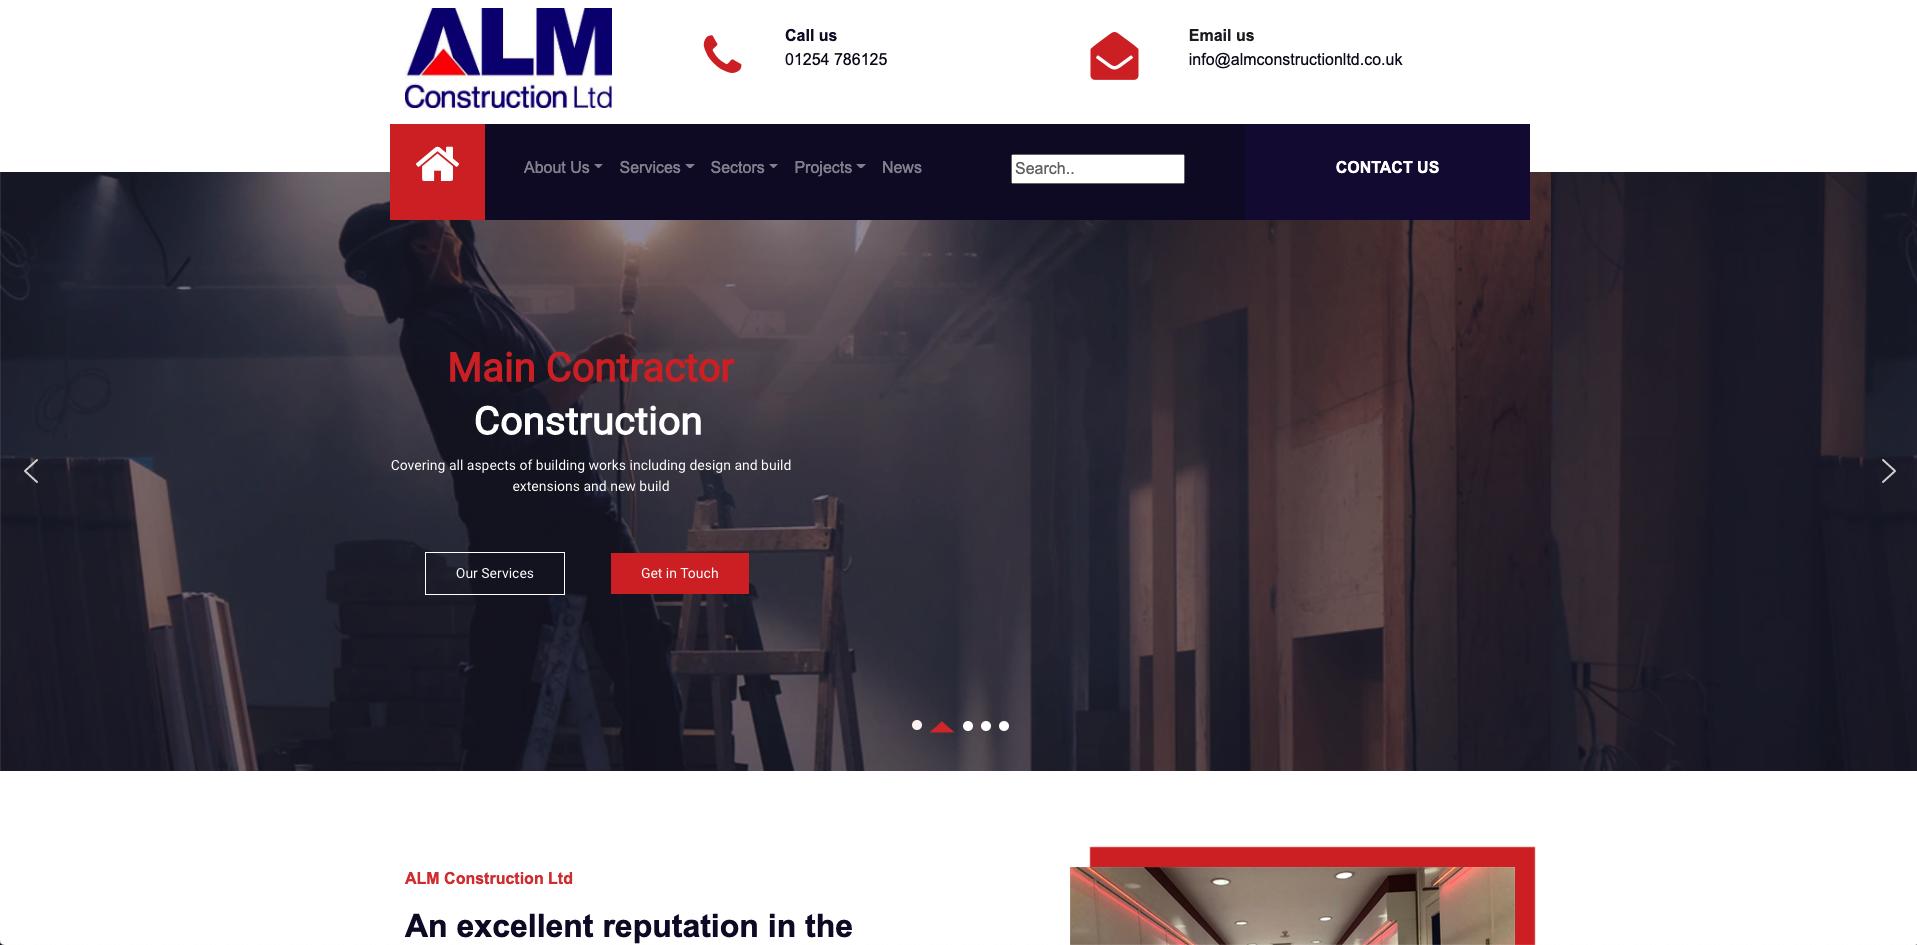 ALM Construction